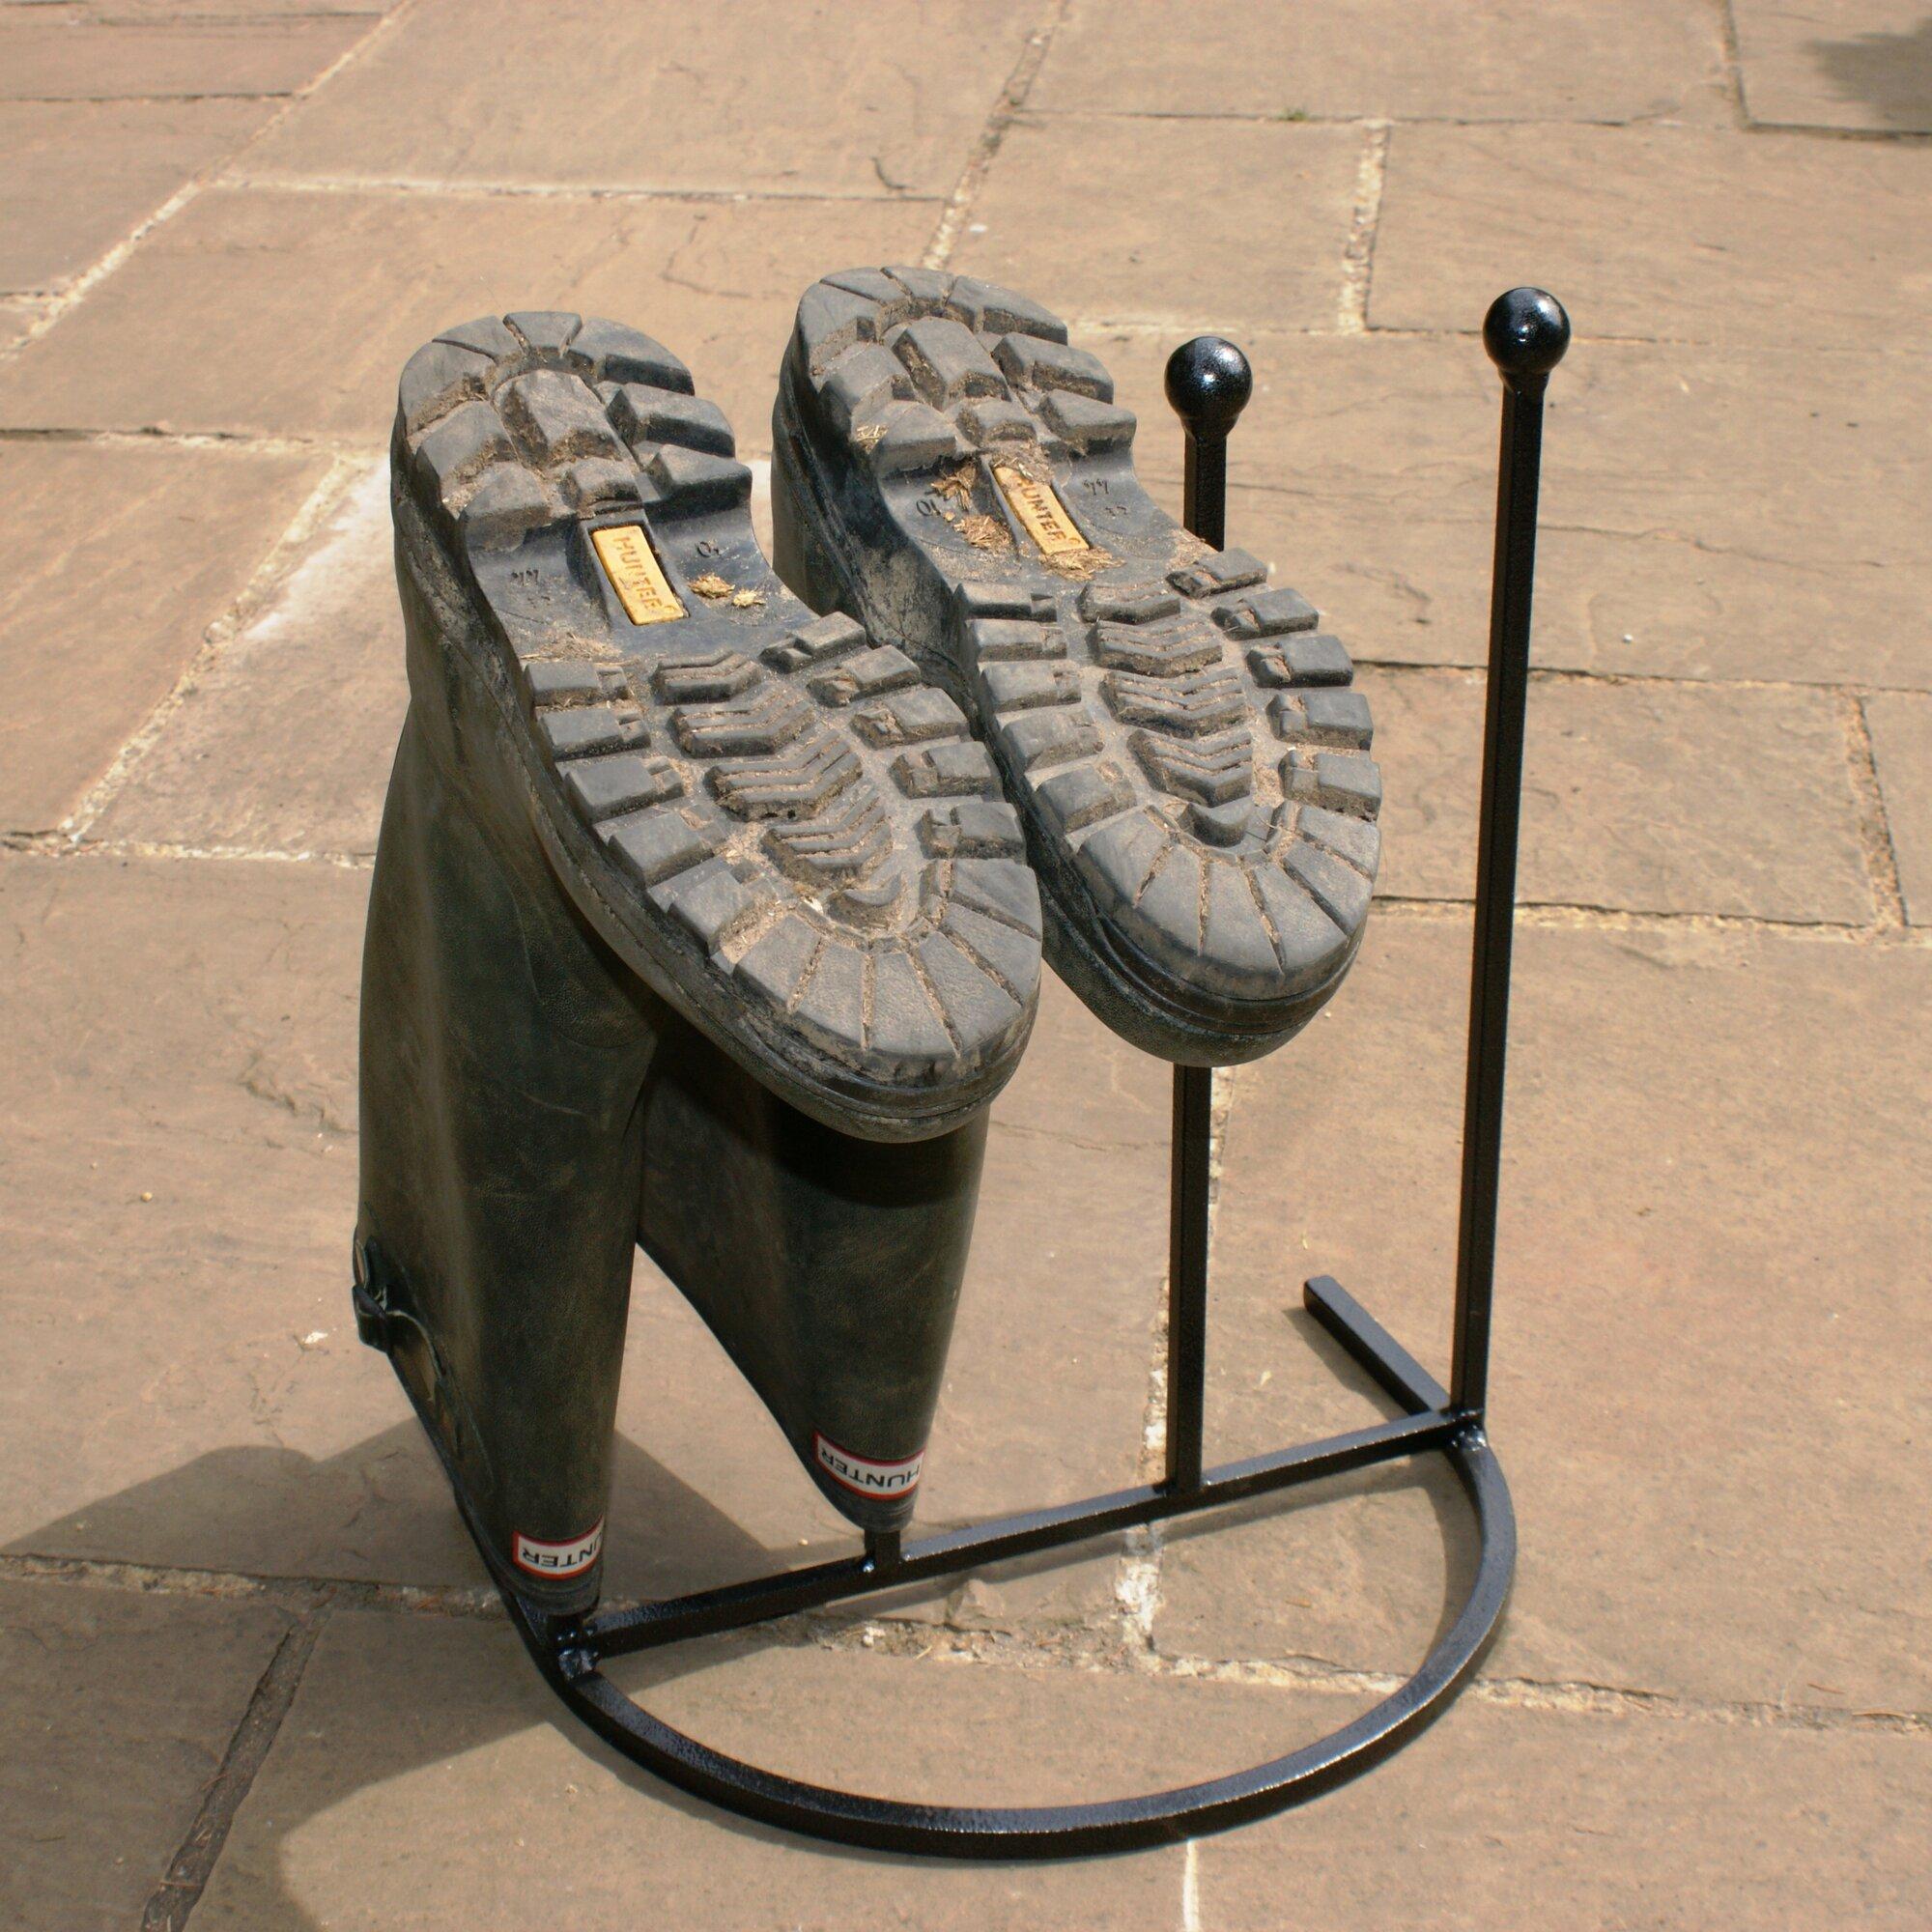 Stiefel Aufbewahrung stiefel aufbewahrung hausdesign pro